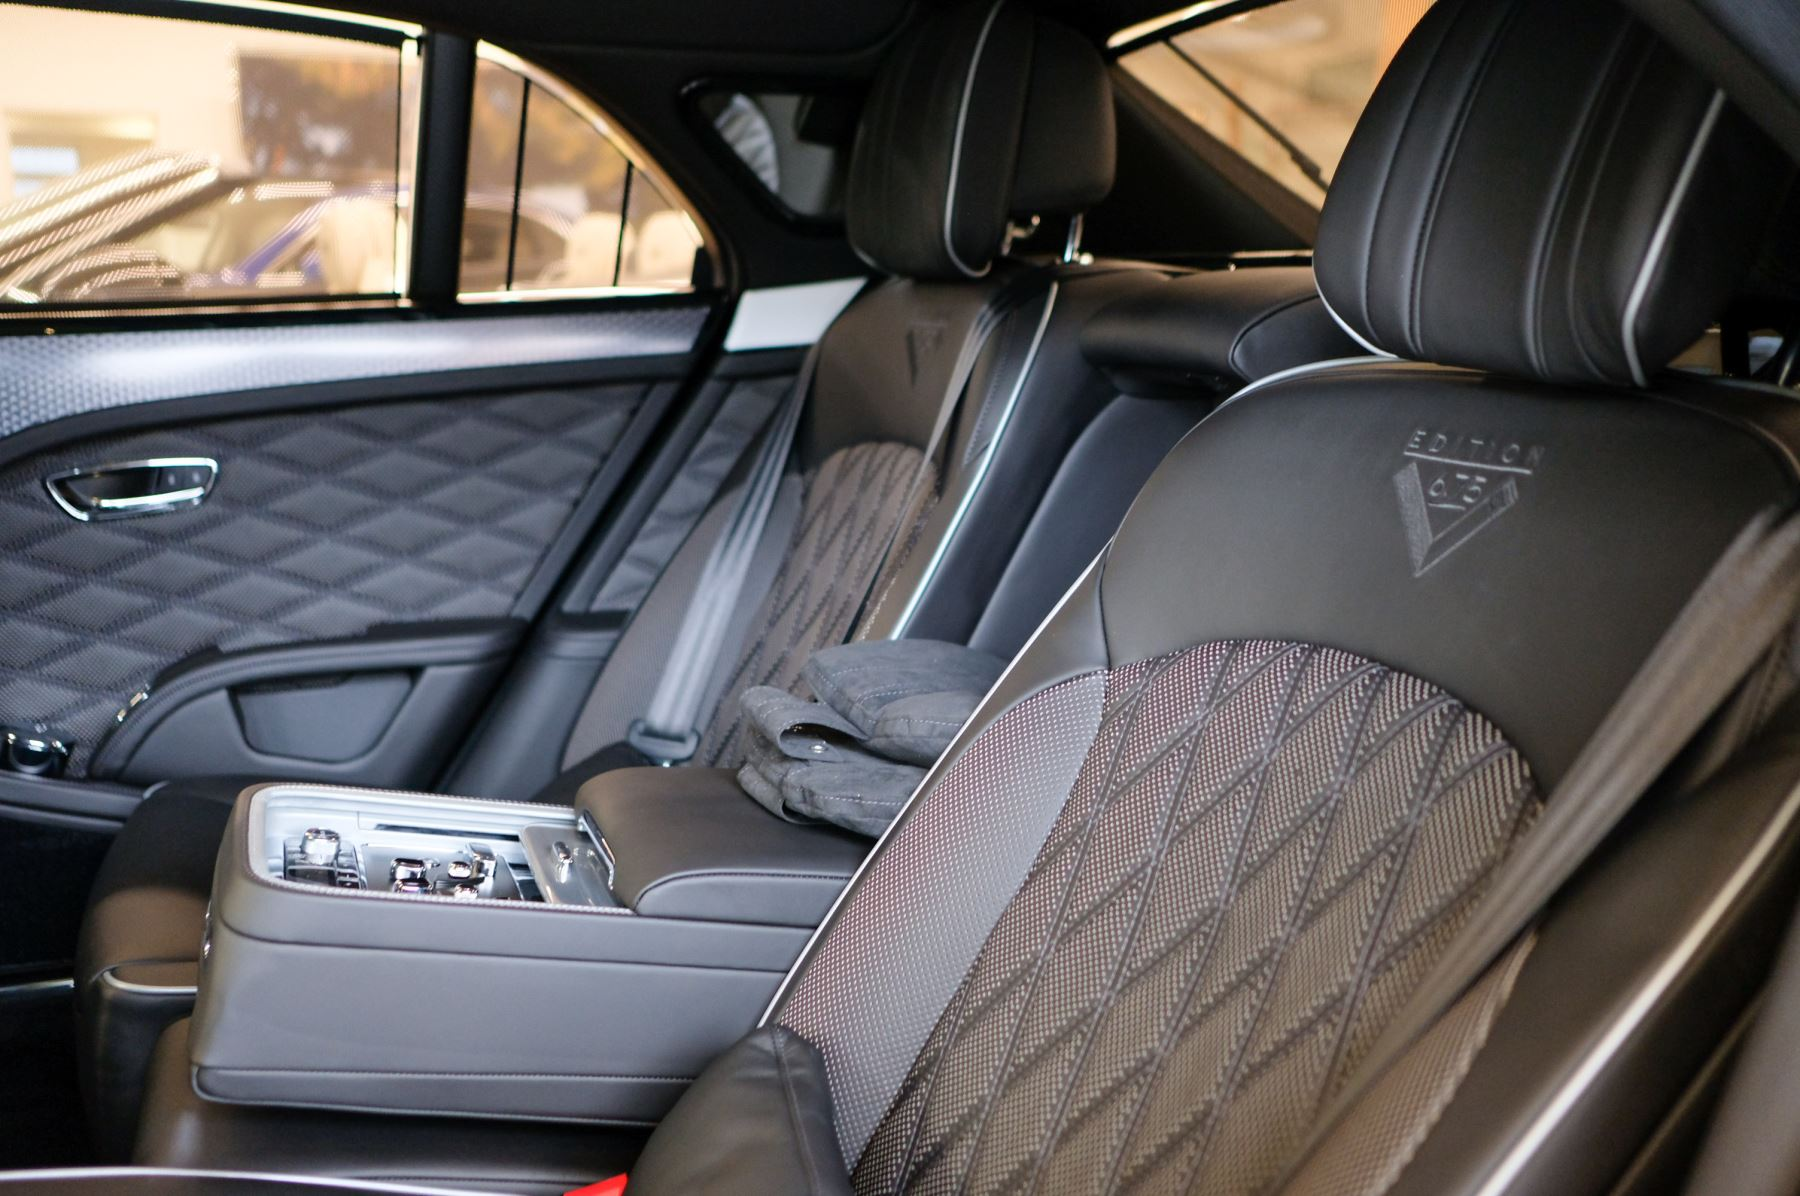 Bentley Mulsanne Mulsanne 6.75 Edition by Mulliner image 20